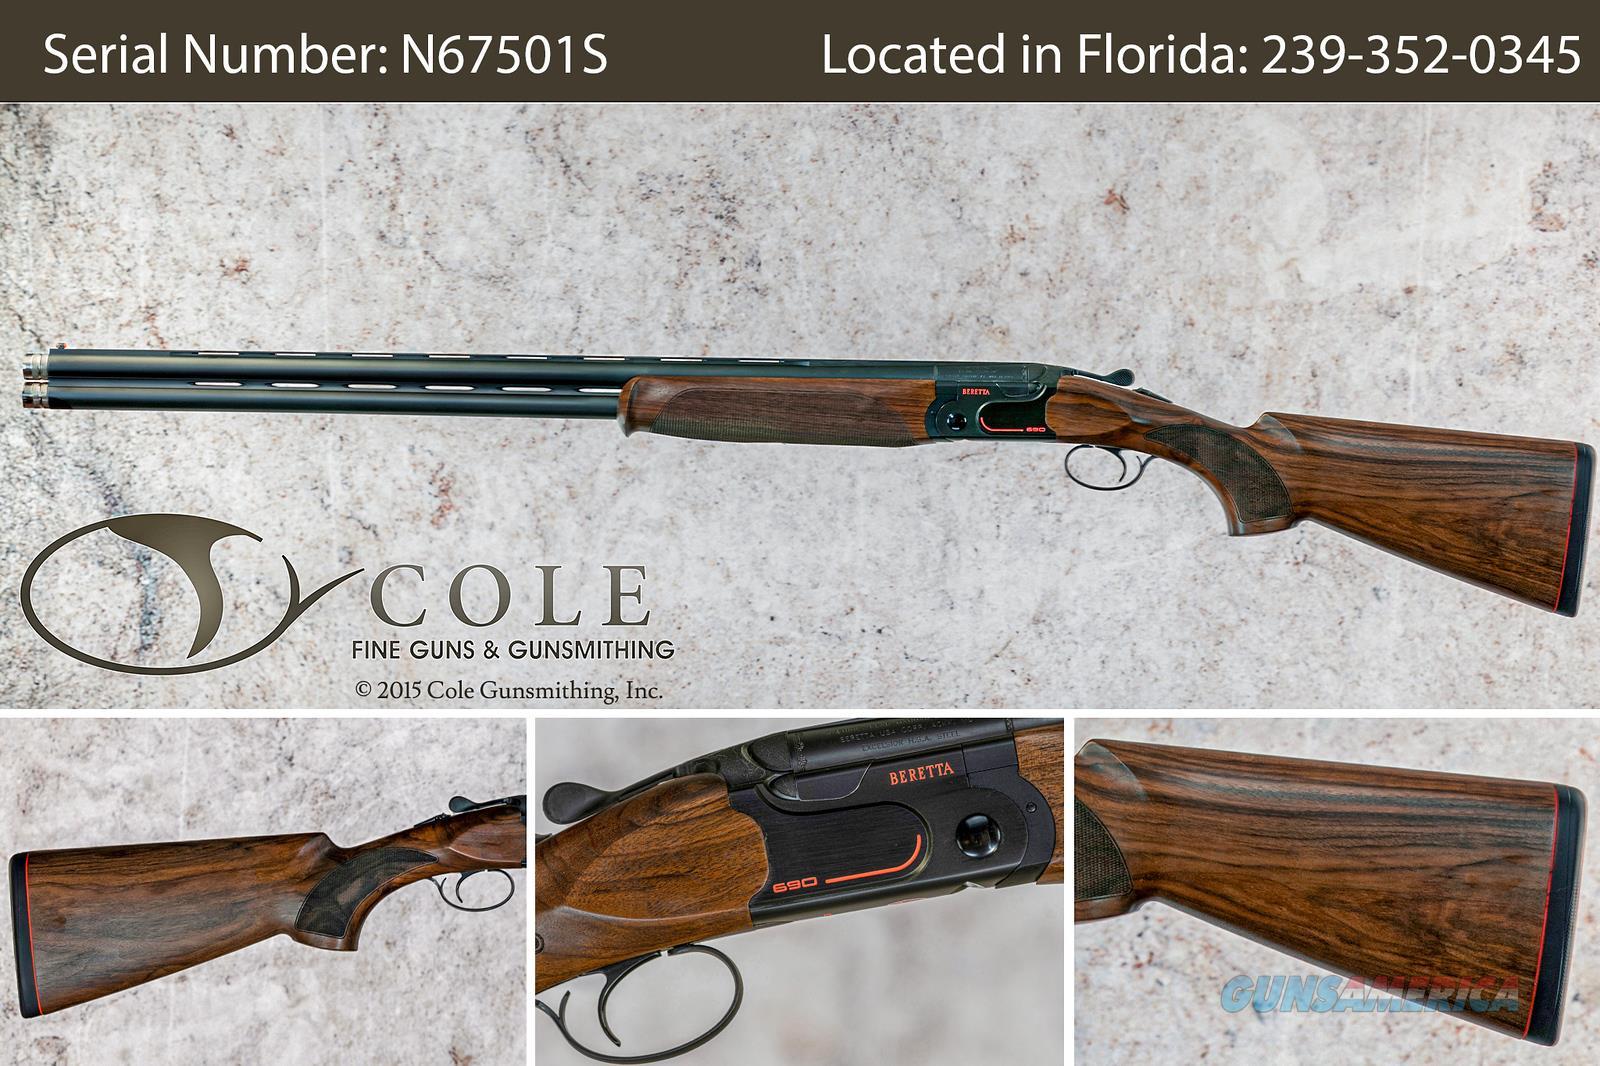 "Beretta 690 Sporting 12g 30"" 690 Sporting 12gaSN# N67501S  Guns > Shotguns > Beretta Shotguns > O/U > Trap/Skeet"